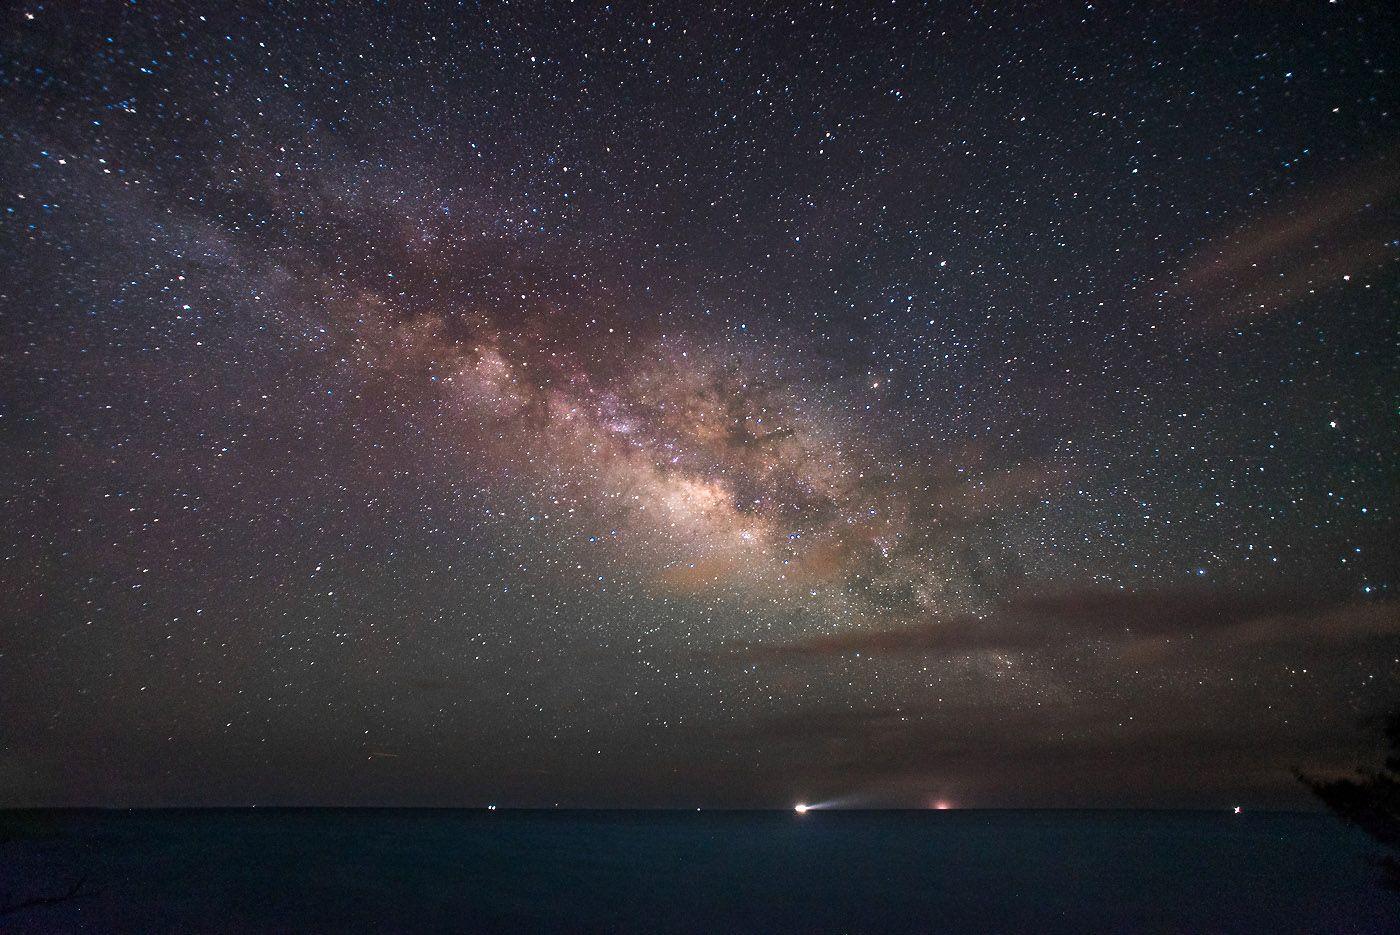 Florida Keys Night Sky Captured After A Wedding By Evanr Photography Tropical Islands Resort Florida Keys Hawks Cay Resort